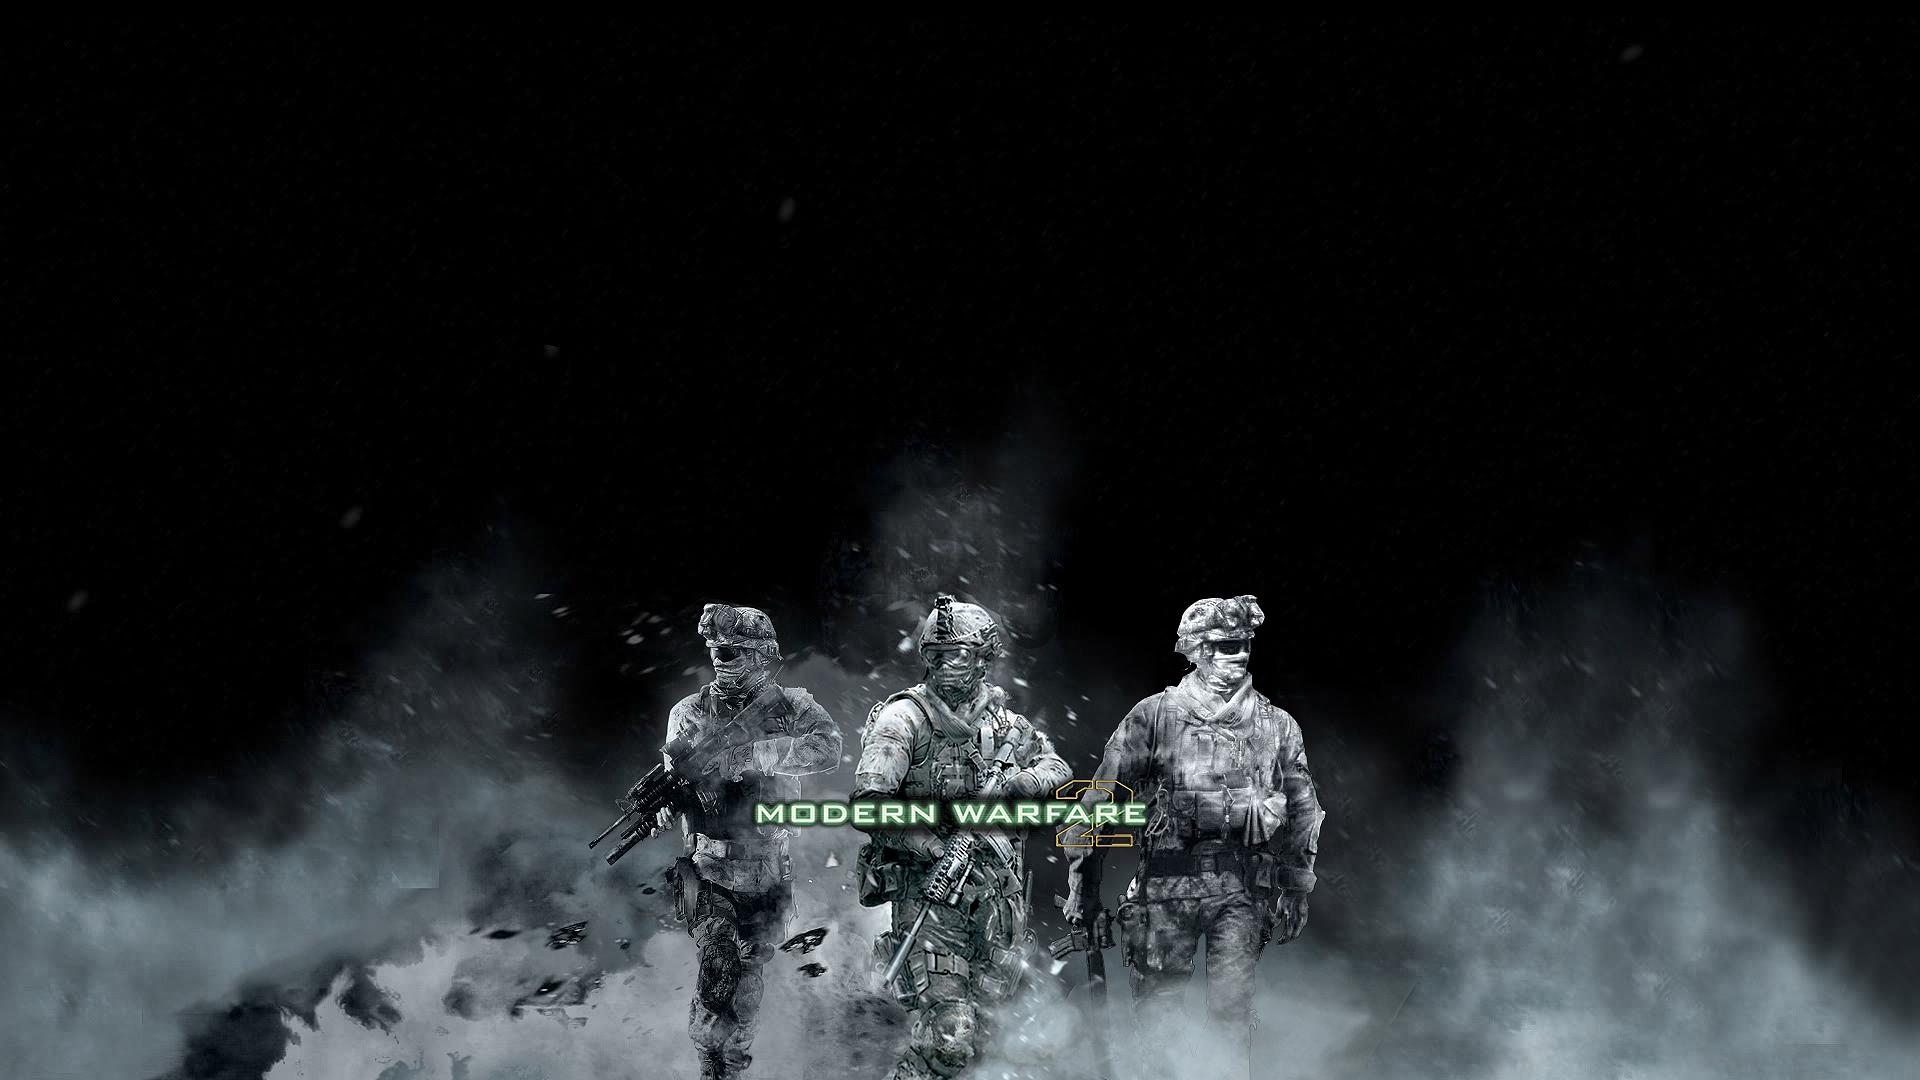 Wallpaper Call Of Duty Modern Warfare 2 Soldiers Smoke